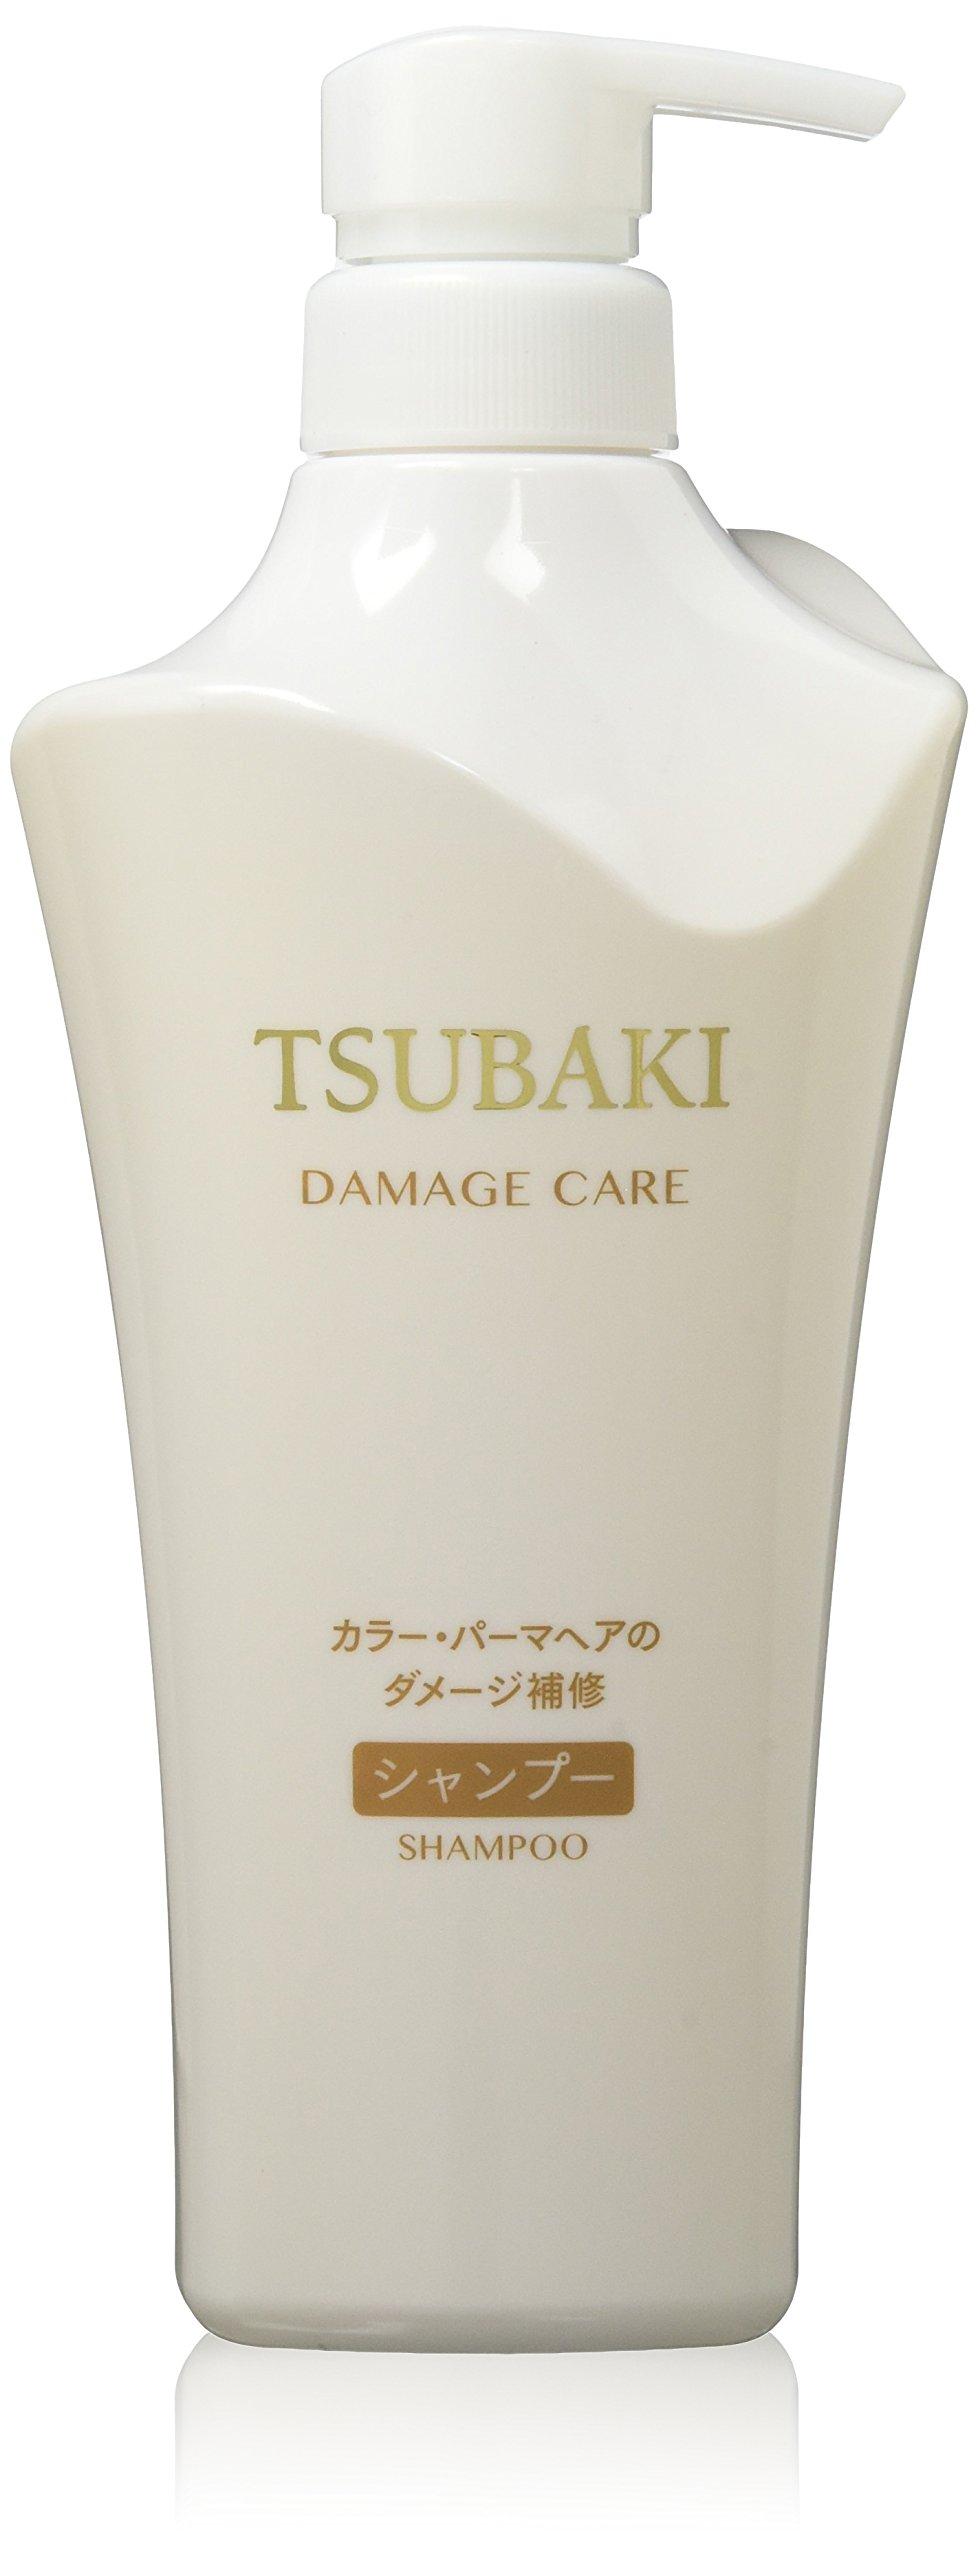 TSUBAKI Shiseido Damage Care Shampoo